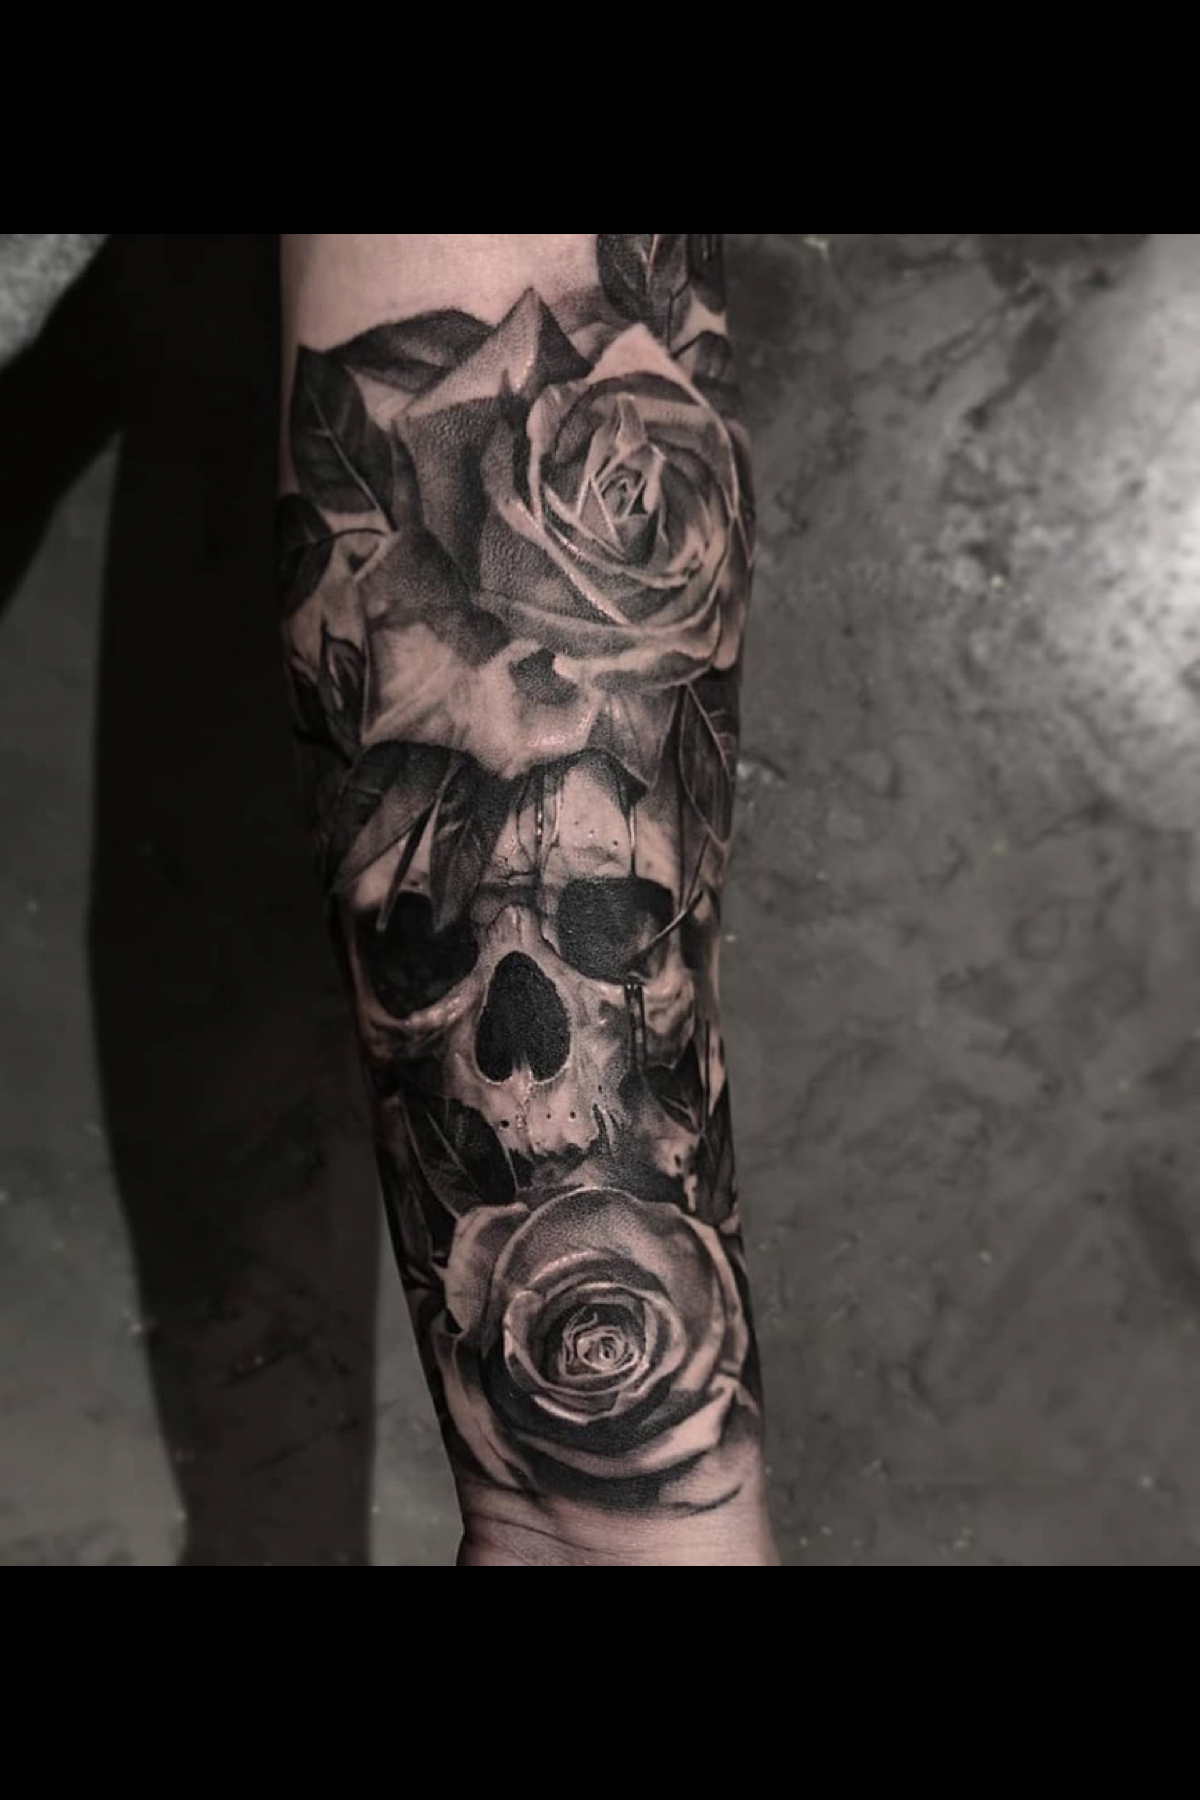 Realistic Black And Grey Skull And Rose Tattoo Made By John Hudic In Switzerland Realistic Tattoo Sleeve Tattoos Rose Tattoo